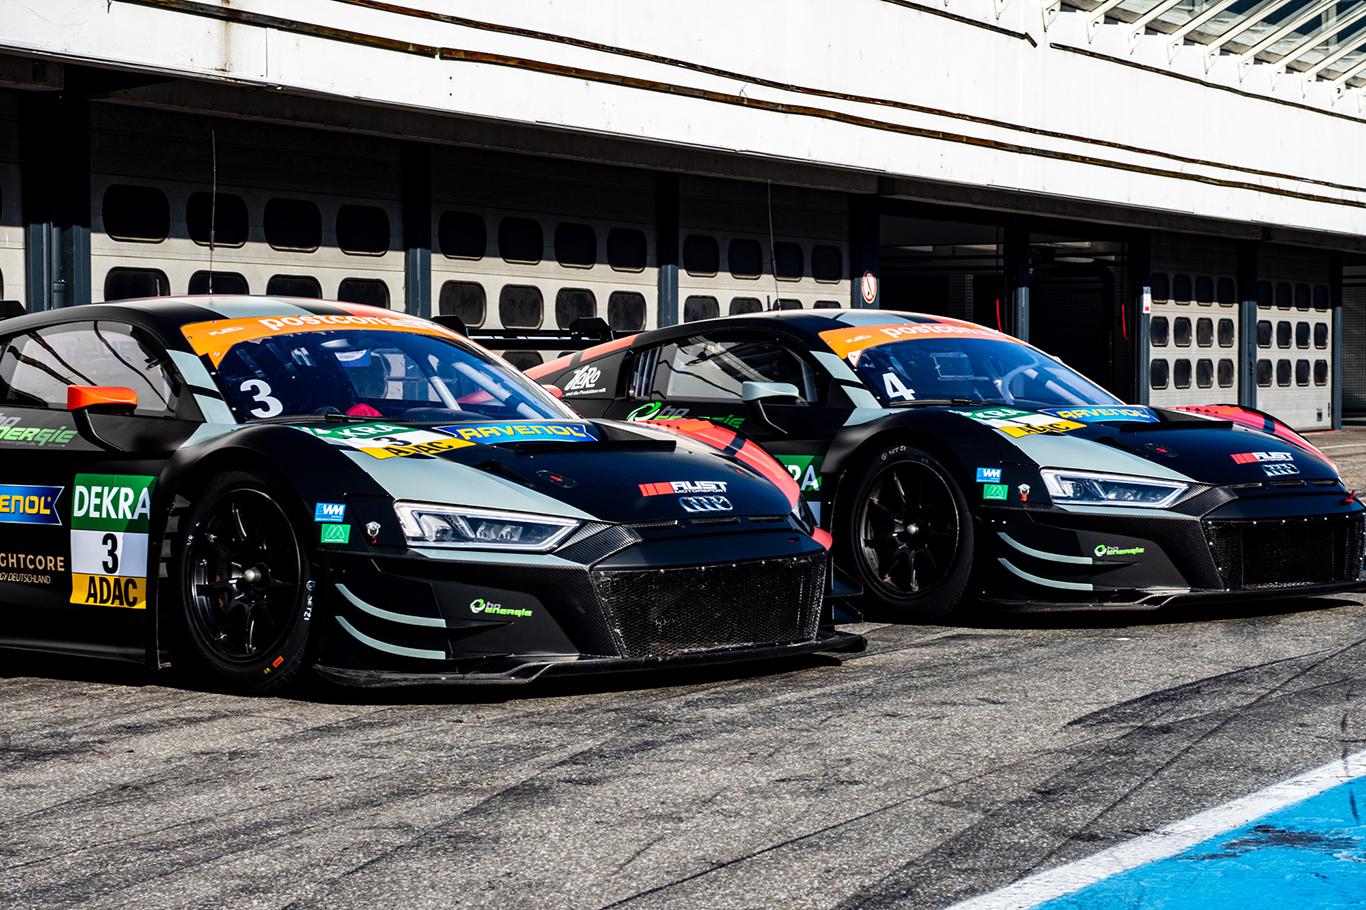 Hendrik von Danwitz to debut in ADAC GT Masters with Aust Motorsport